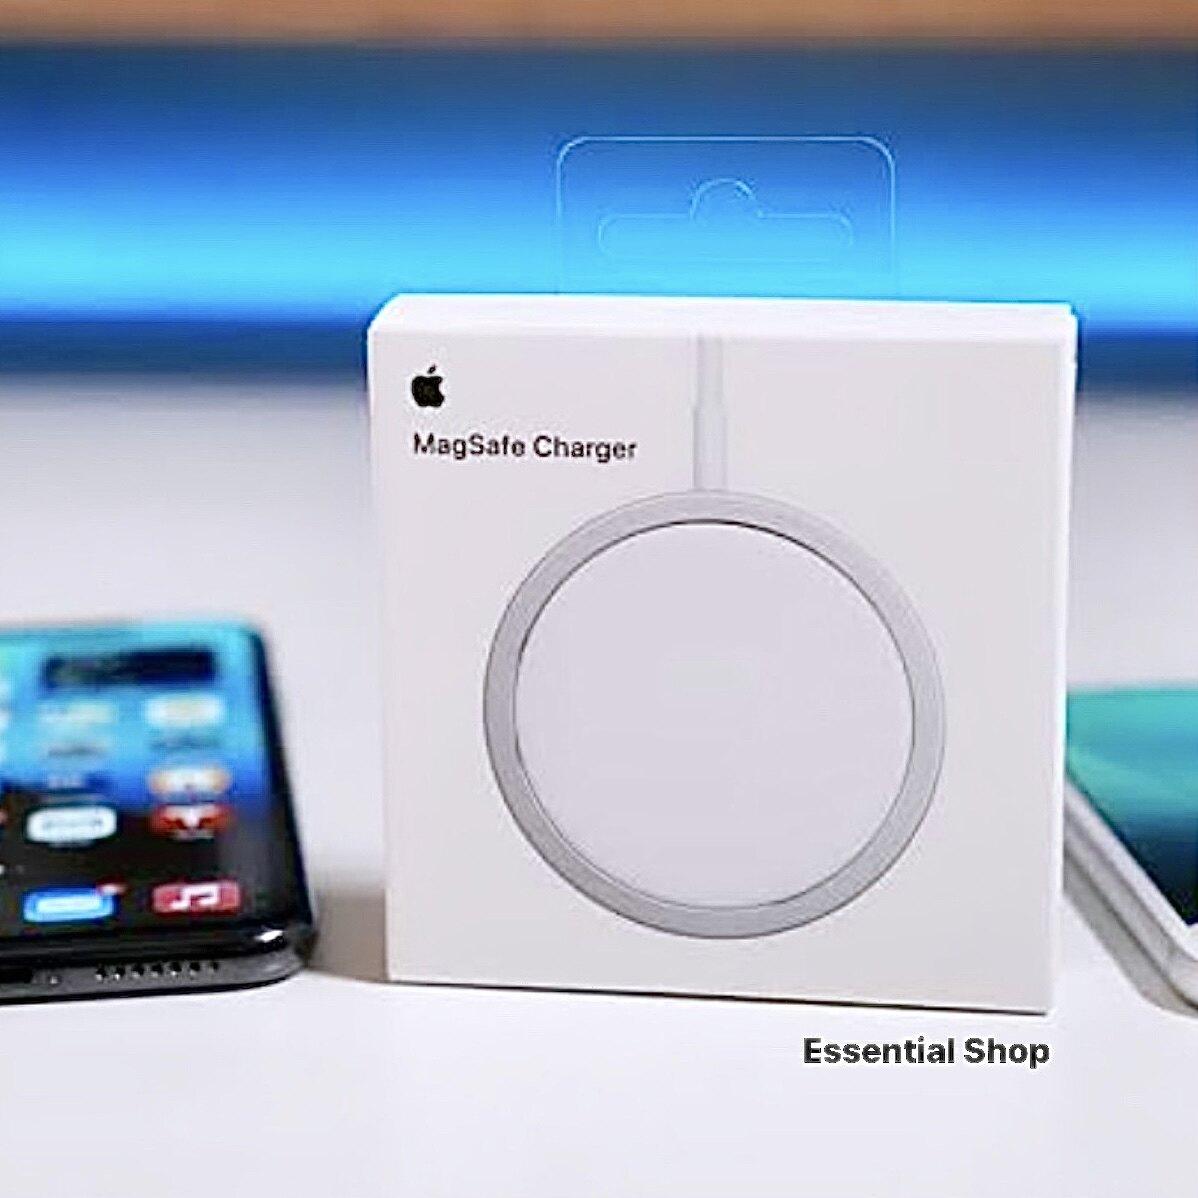 ? Magsafe Charger แท้ ✅ Magsafe Iphone Charge Magsafe Iphone12 แท่น หัวชาร์จเร็ว ที่ชาร์จไร้สาย Iphone 12 11 20w ไอโฟน 12 หัวชาร์จไอโฟน หัวชาร์จไร้สาย หัวชาร์จ Type C.